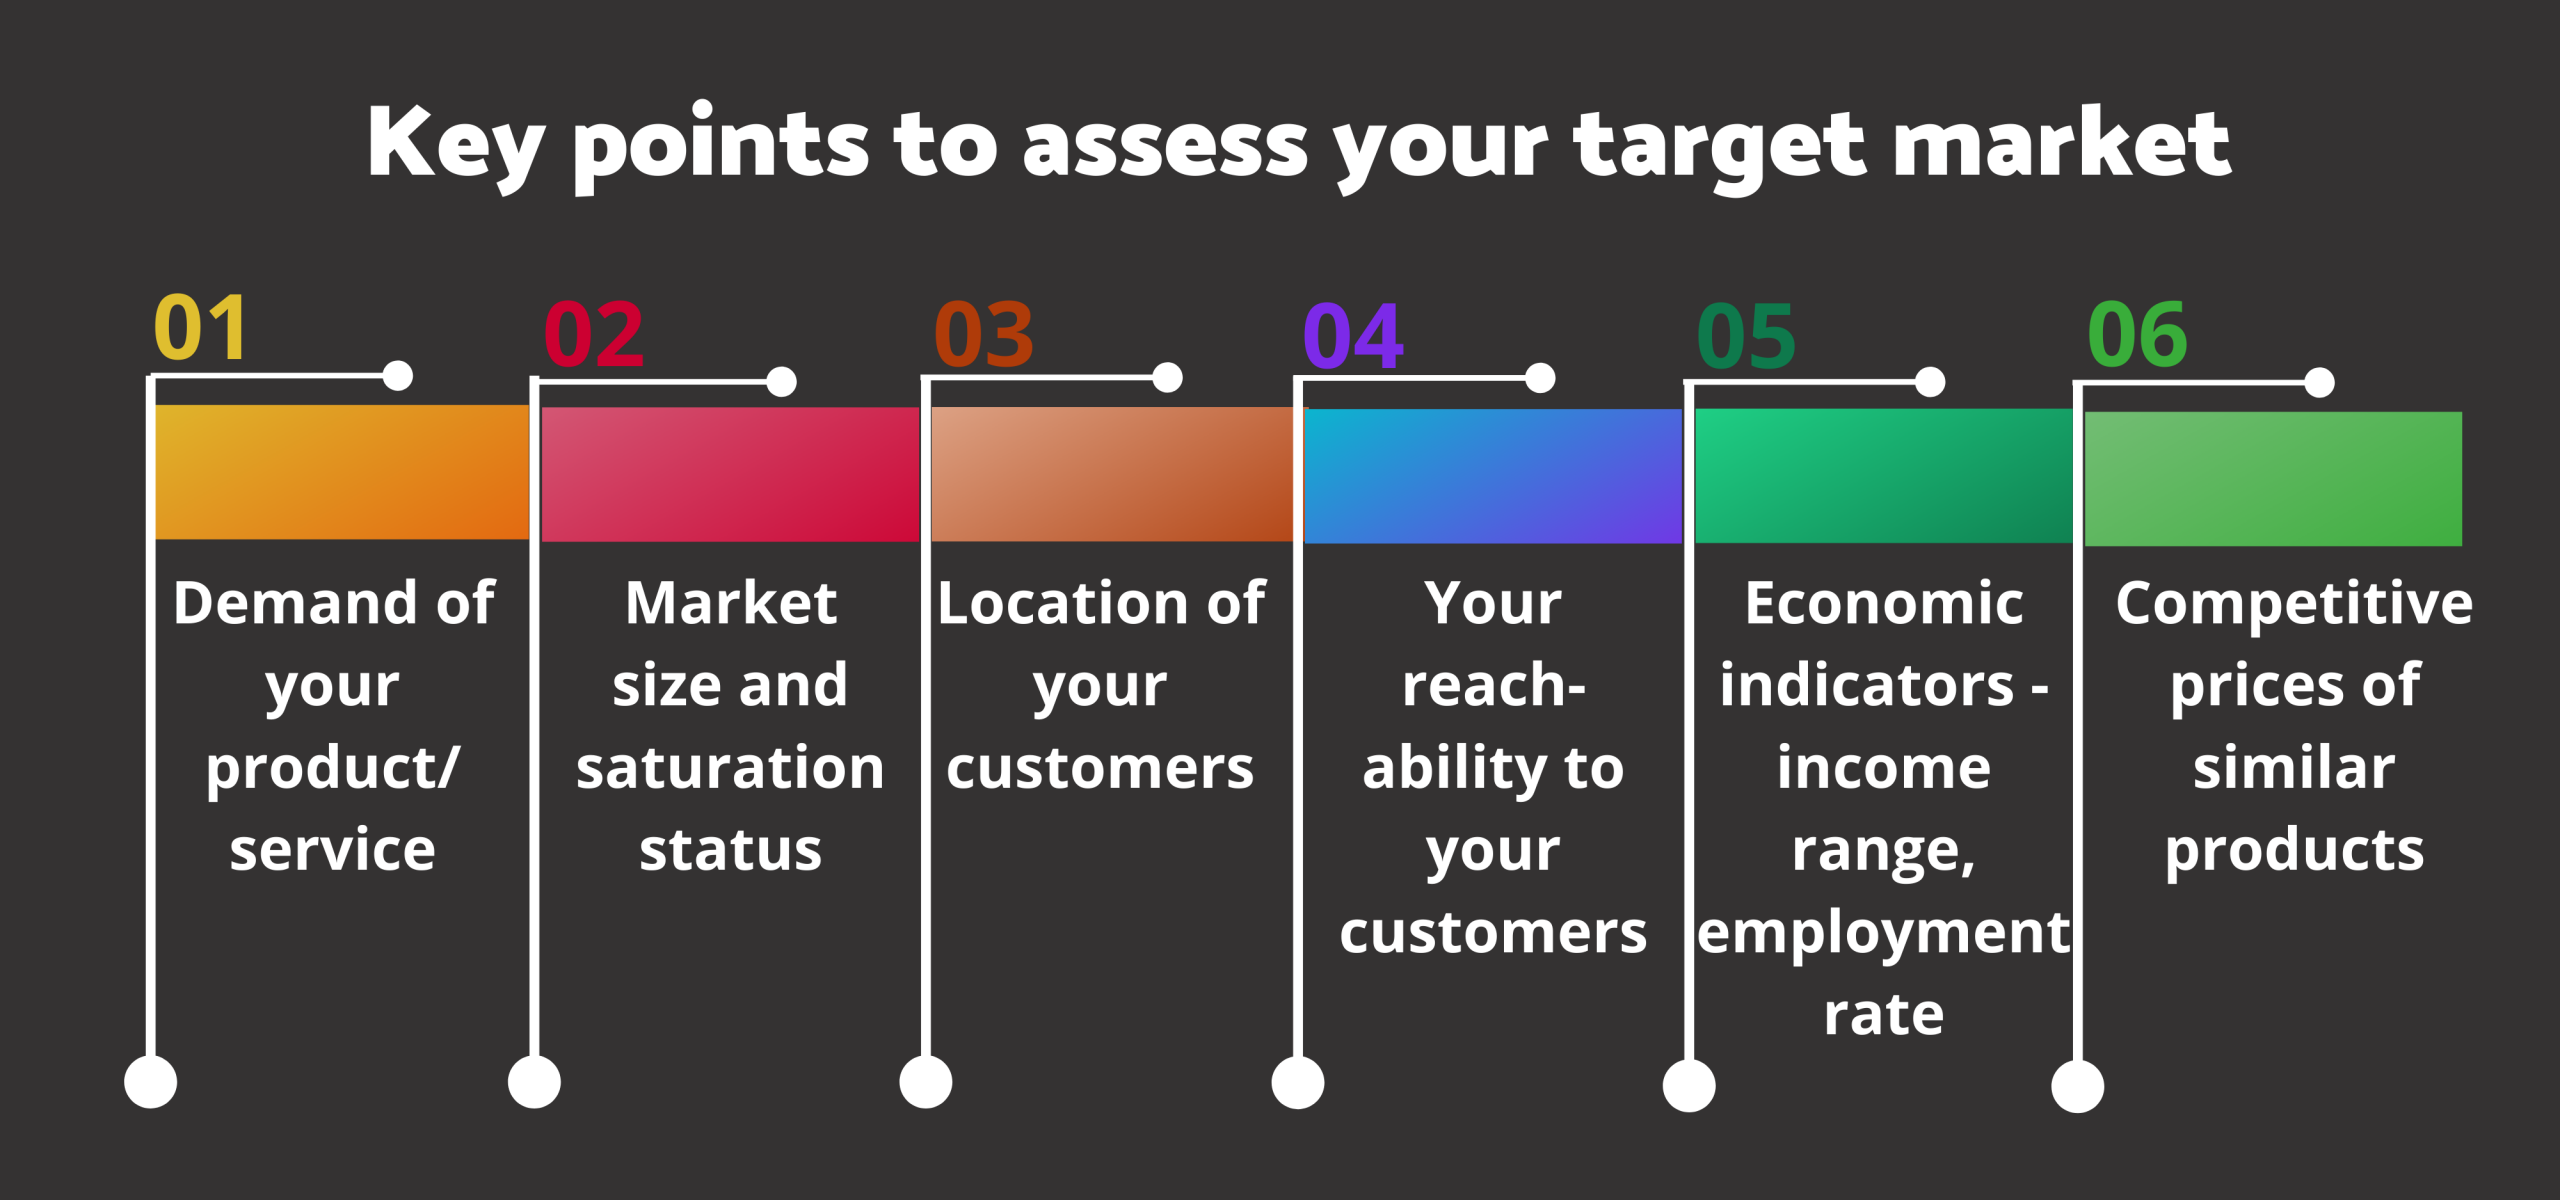 assessing target market